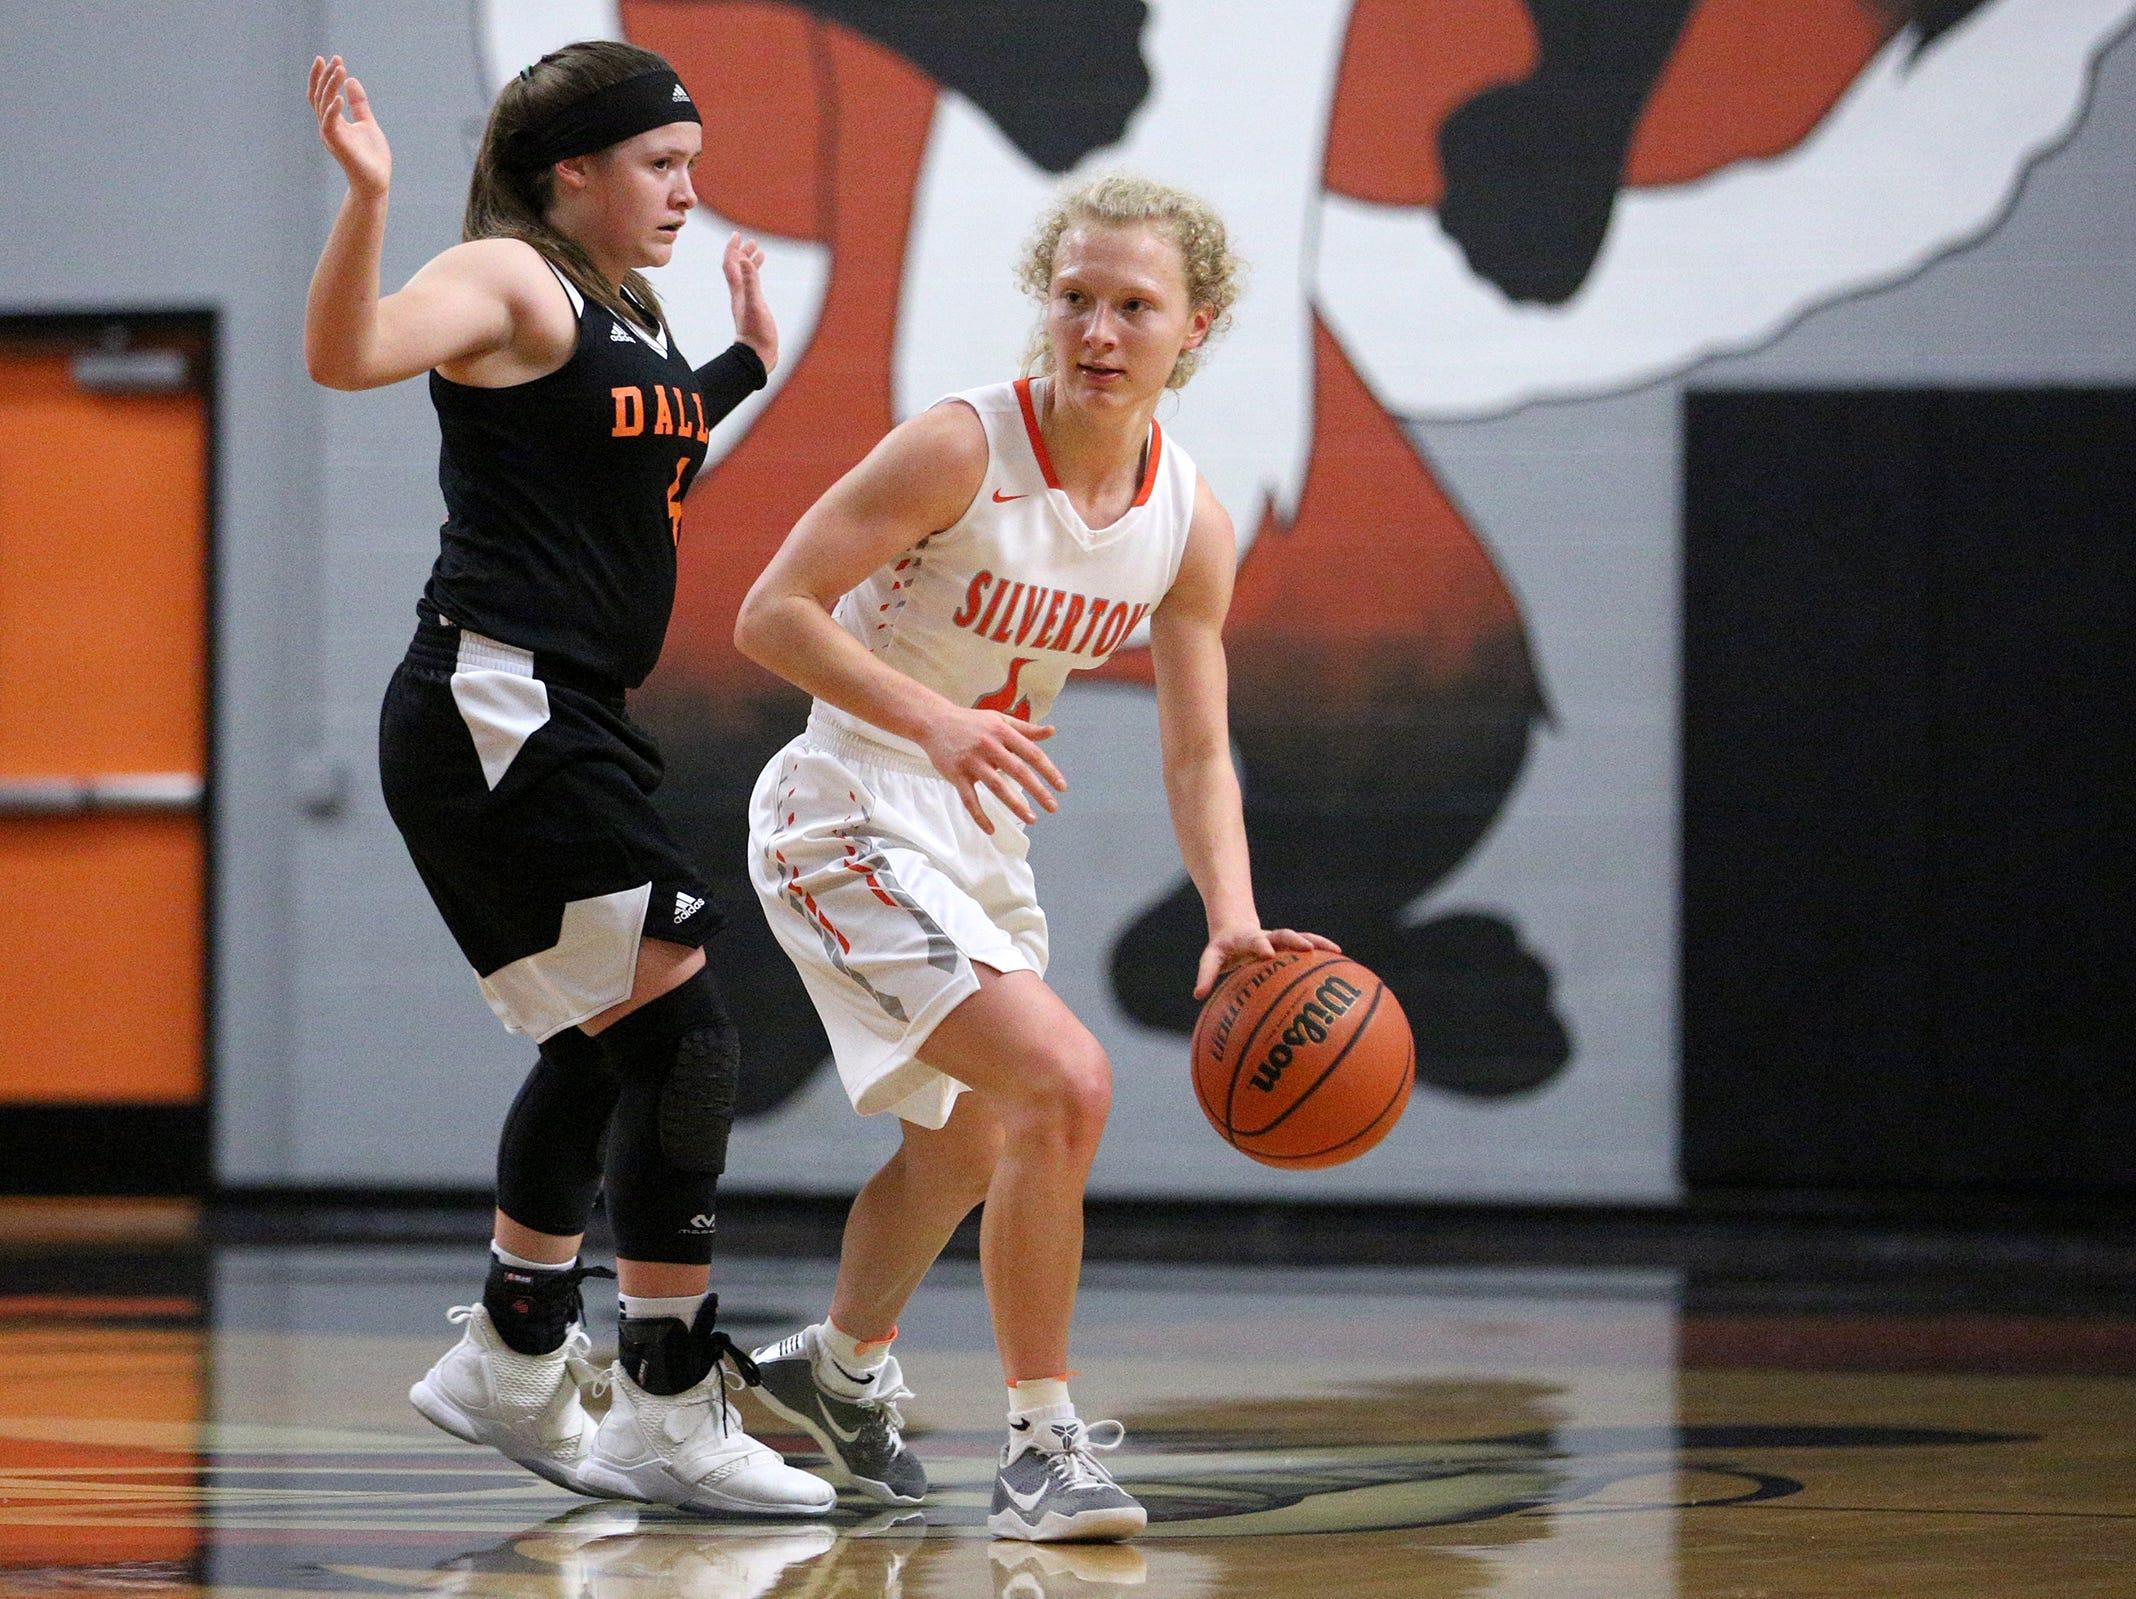 Silverton's Ellie Schmitz (4) gets around Dallas' defense during the Dallas High School vs. Silverton High School girls basketball game in Silverton on Tuesday, Dec. 8, 2019.